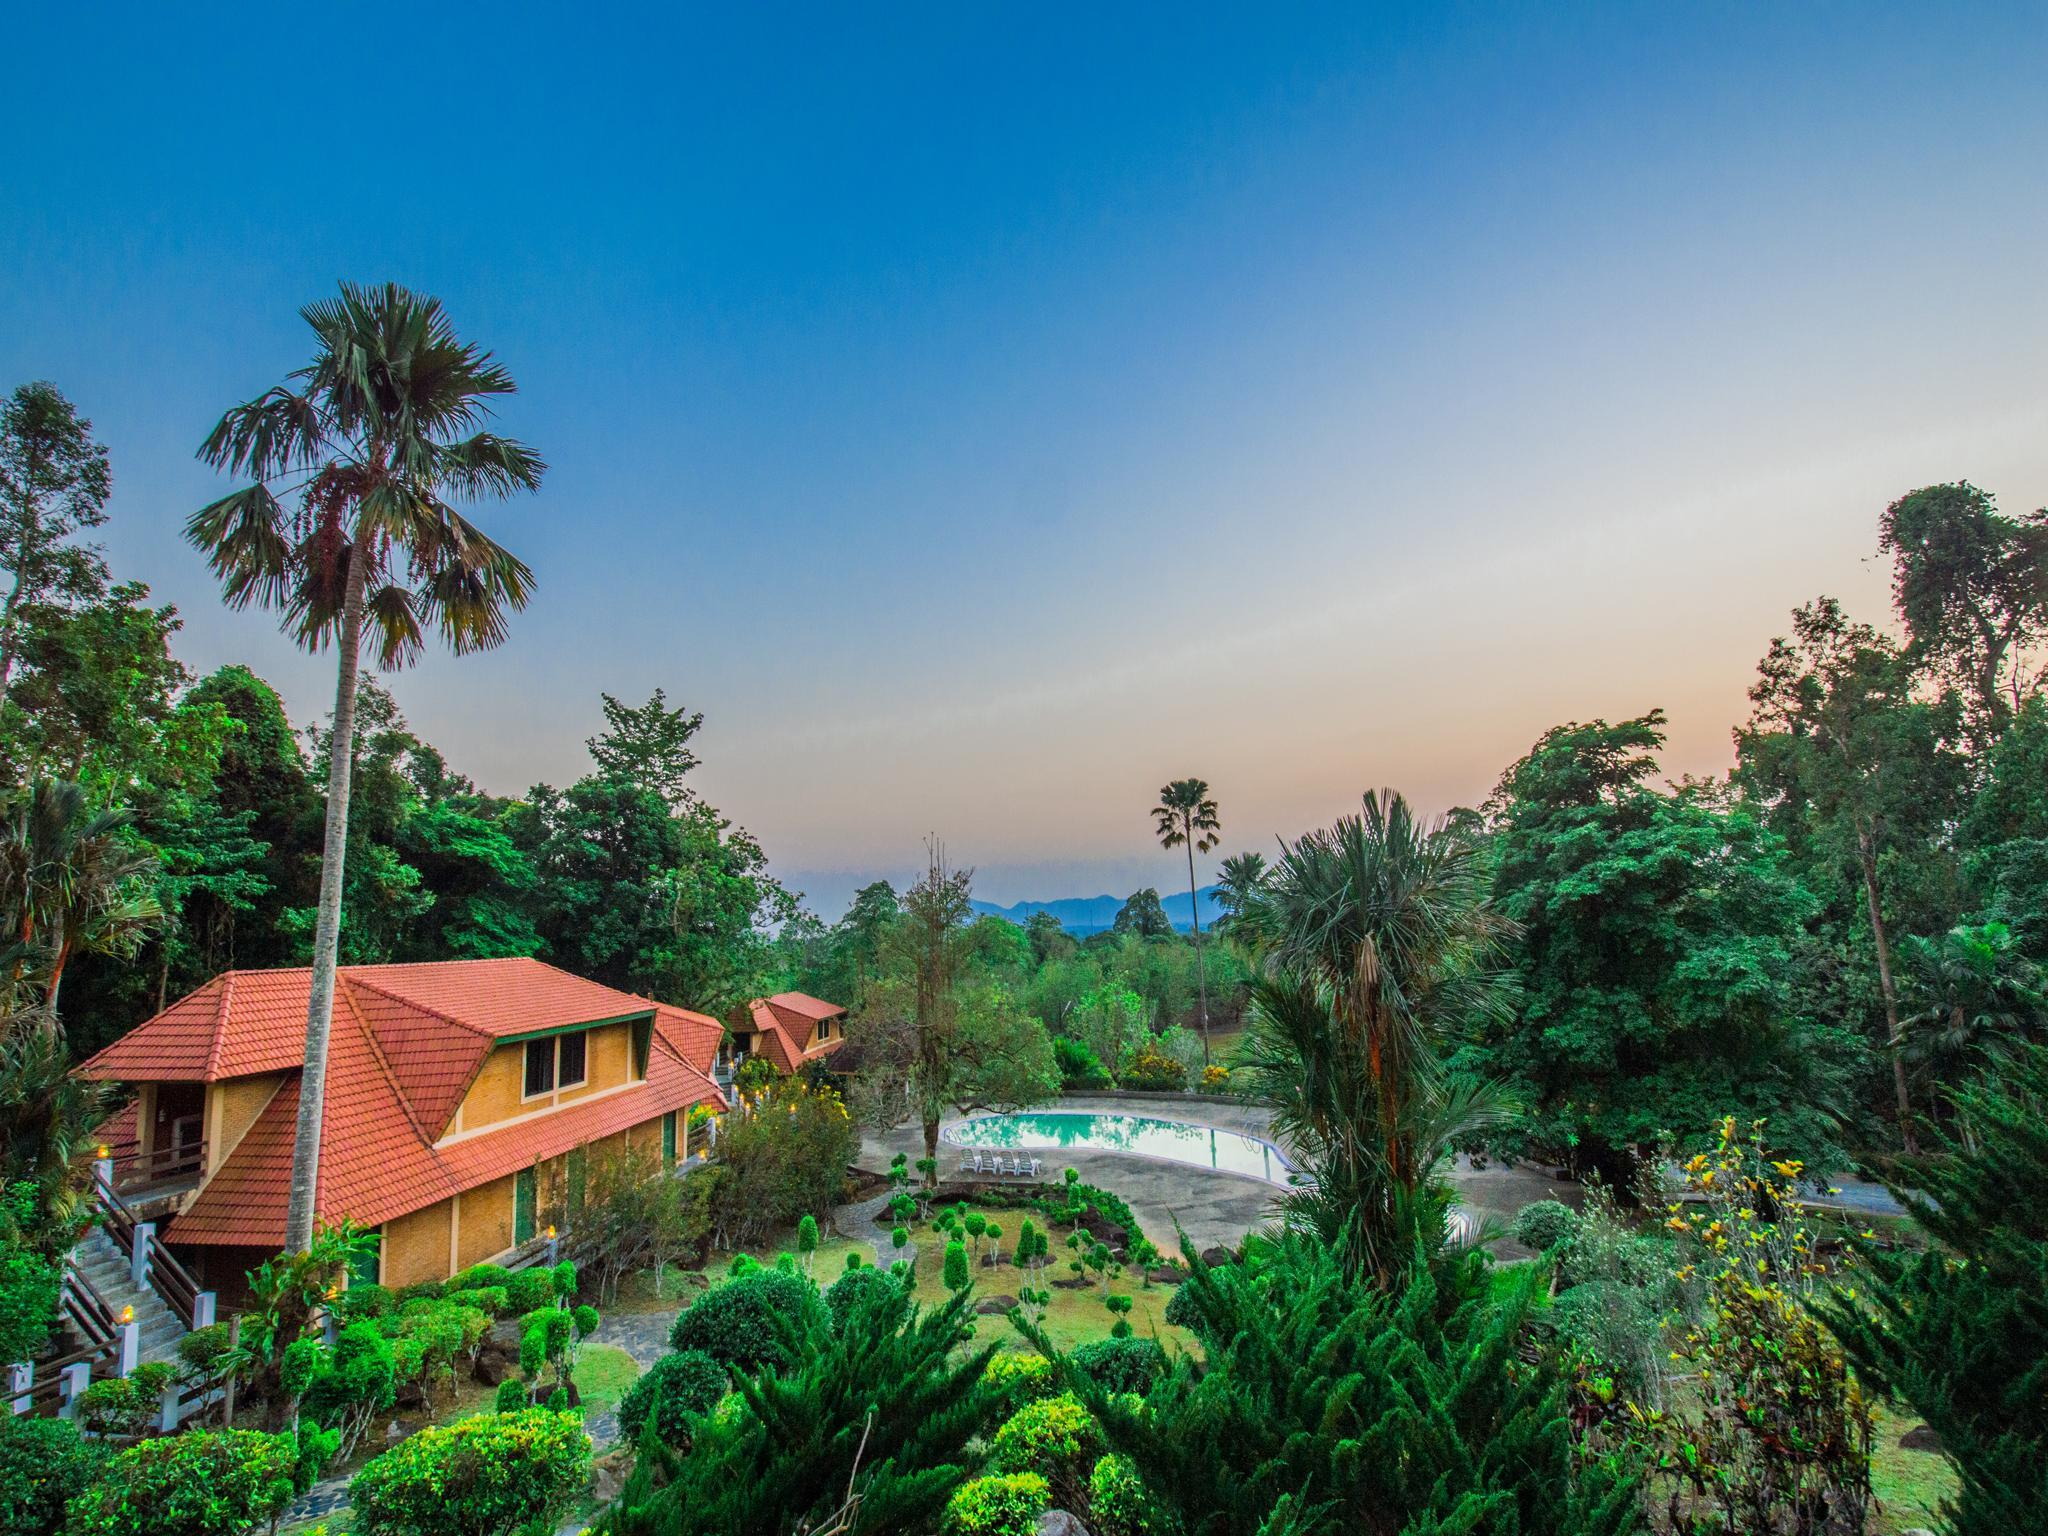 Krating Country Resort